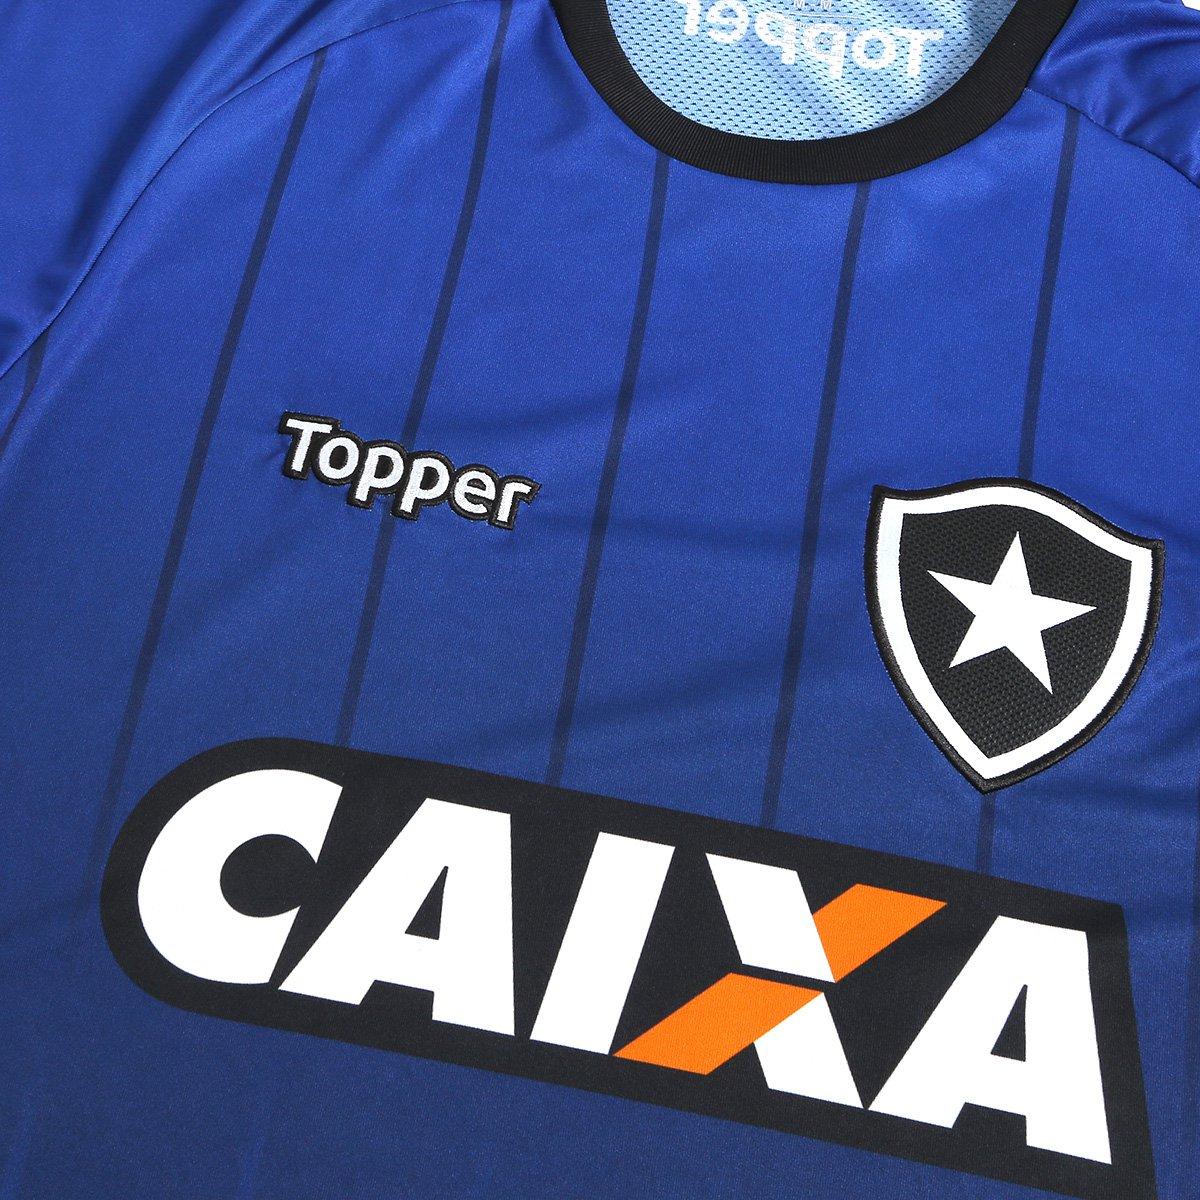 Camisa Botafogo Treino Atleta Topper Masculina - Azul e Preto ... f8b24dd9dac6e